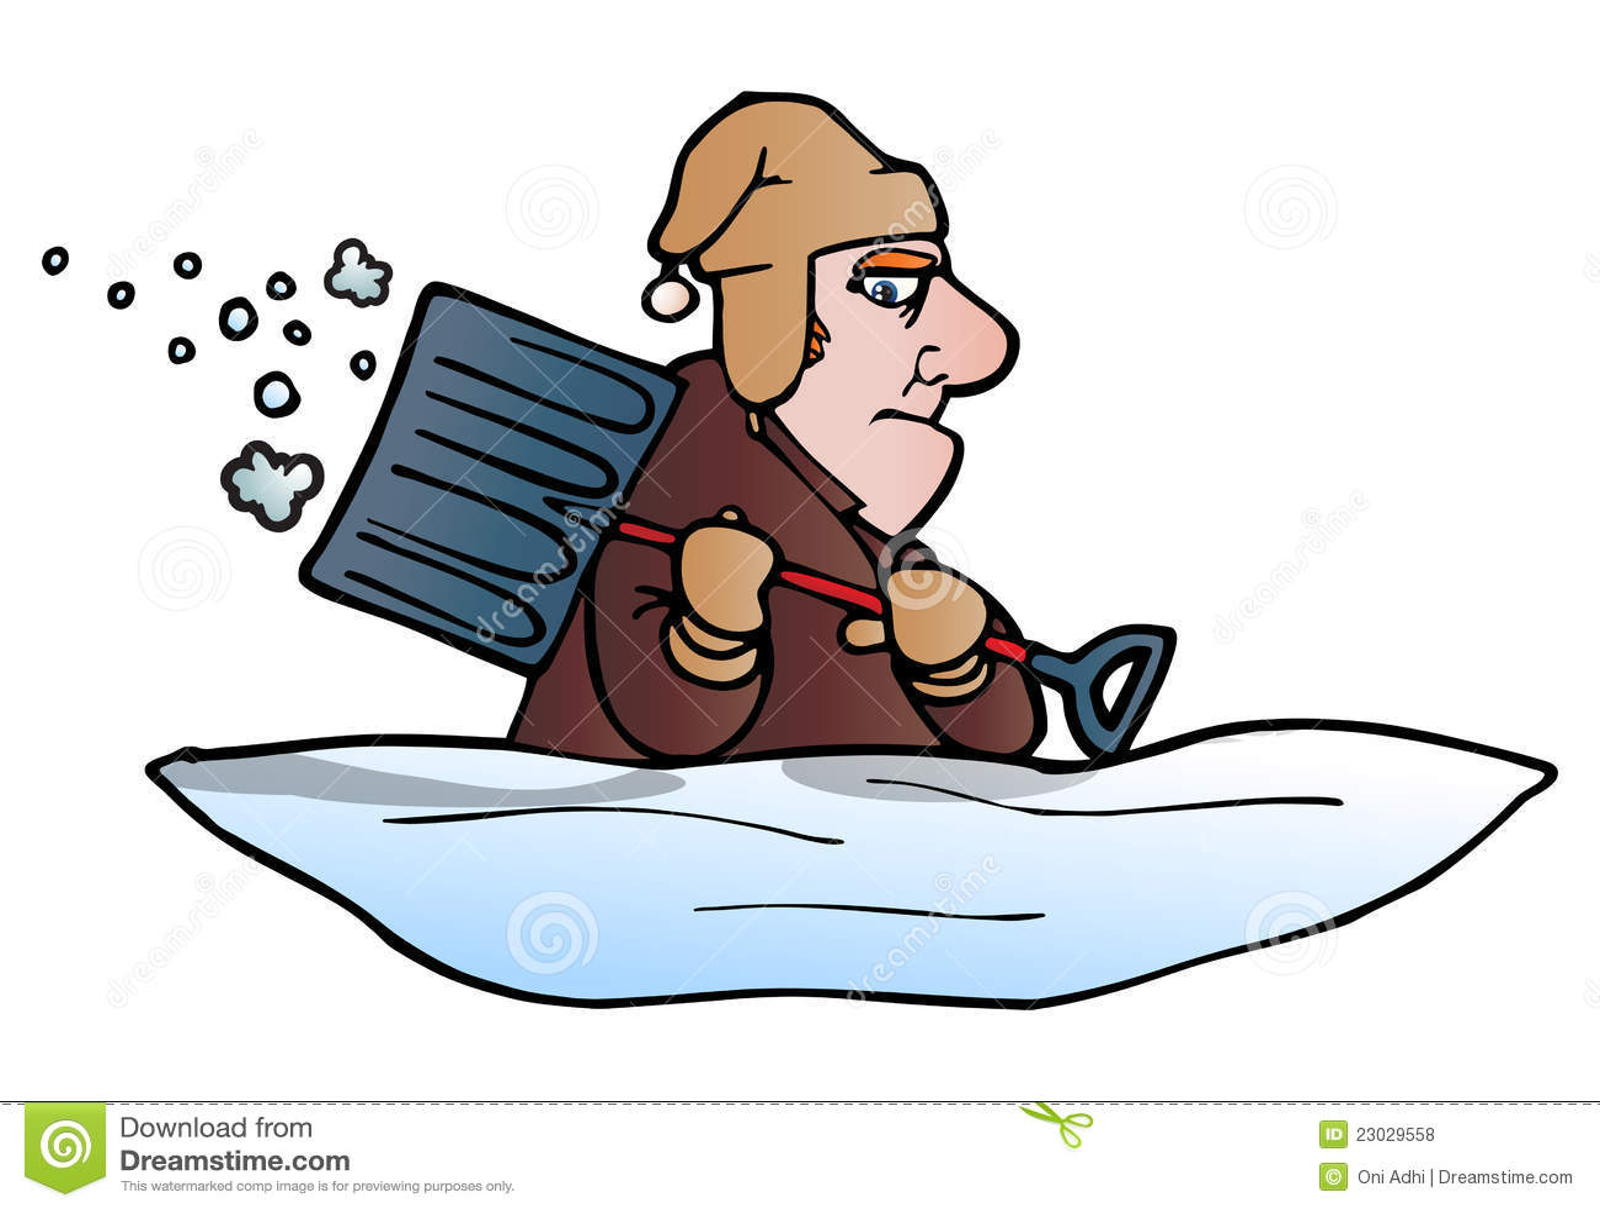 shoveling snow clipart | Logo More